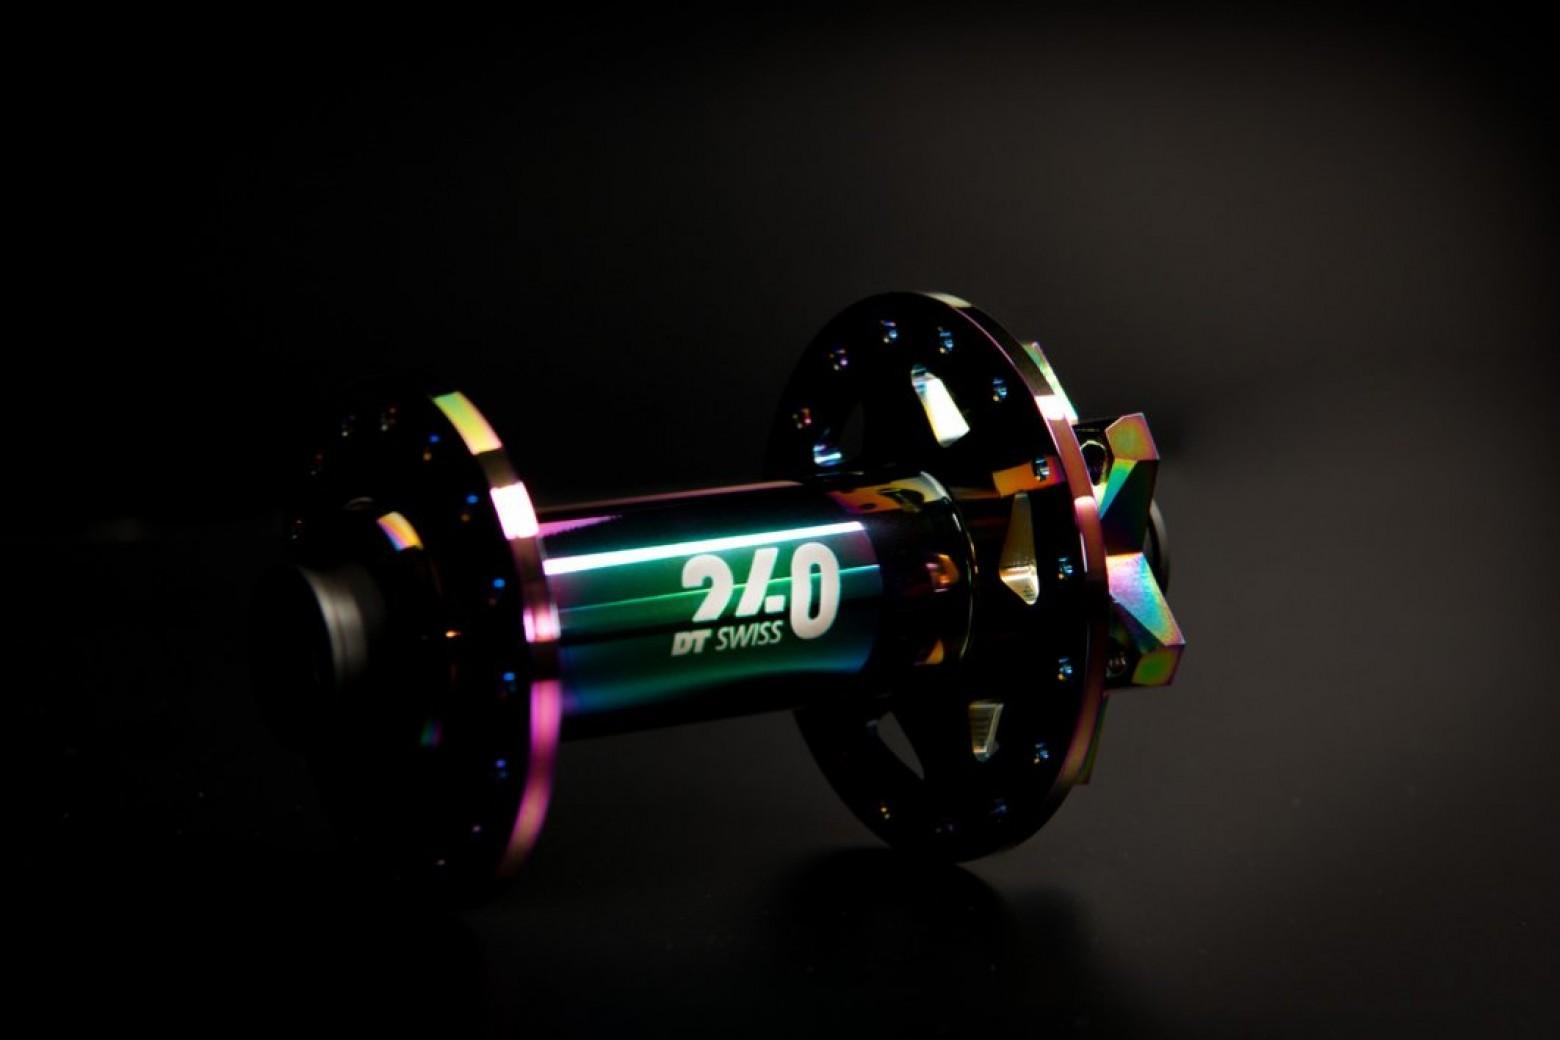 dt-swiss-bujes-240-oil-slick/